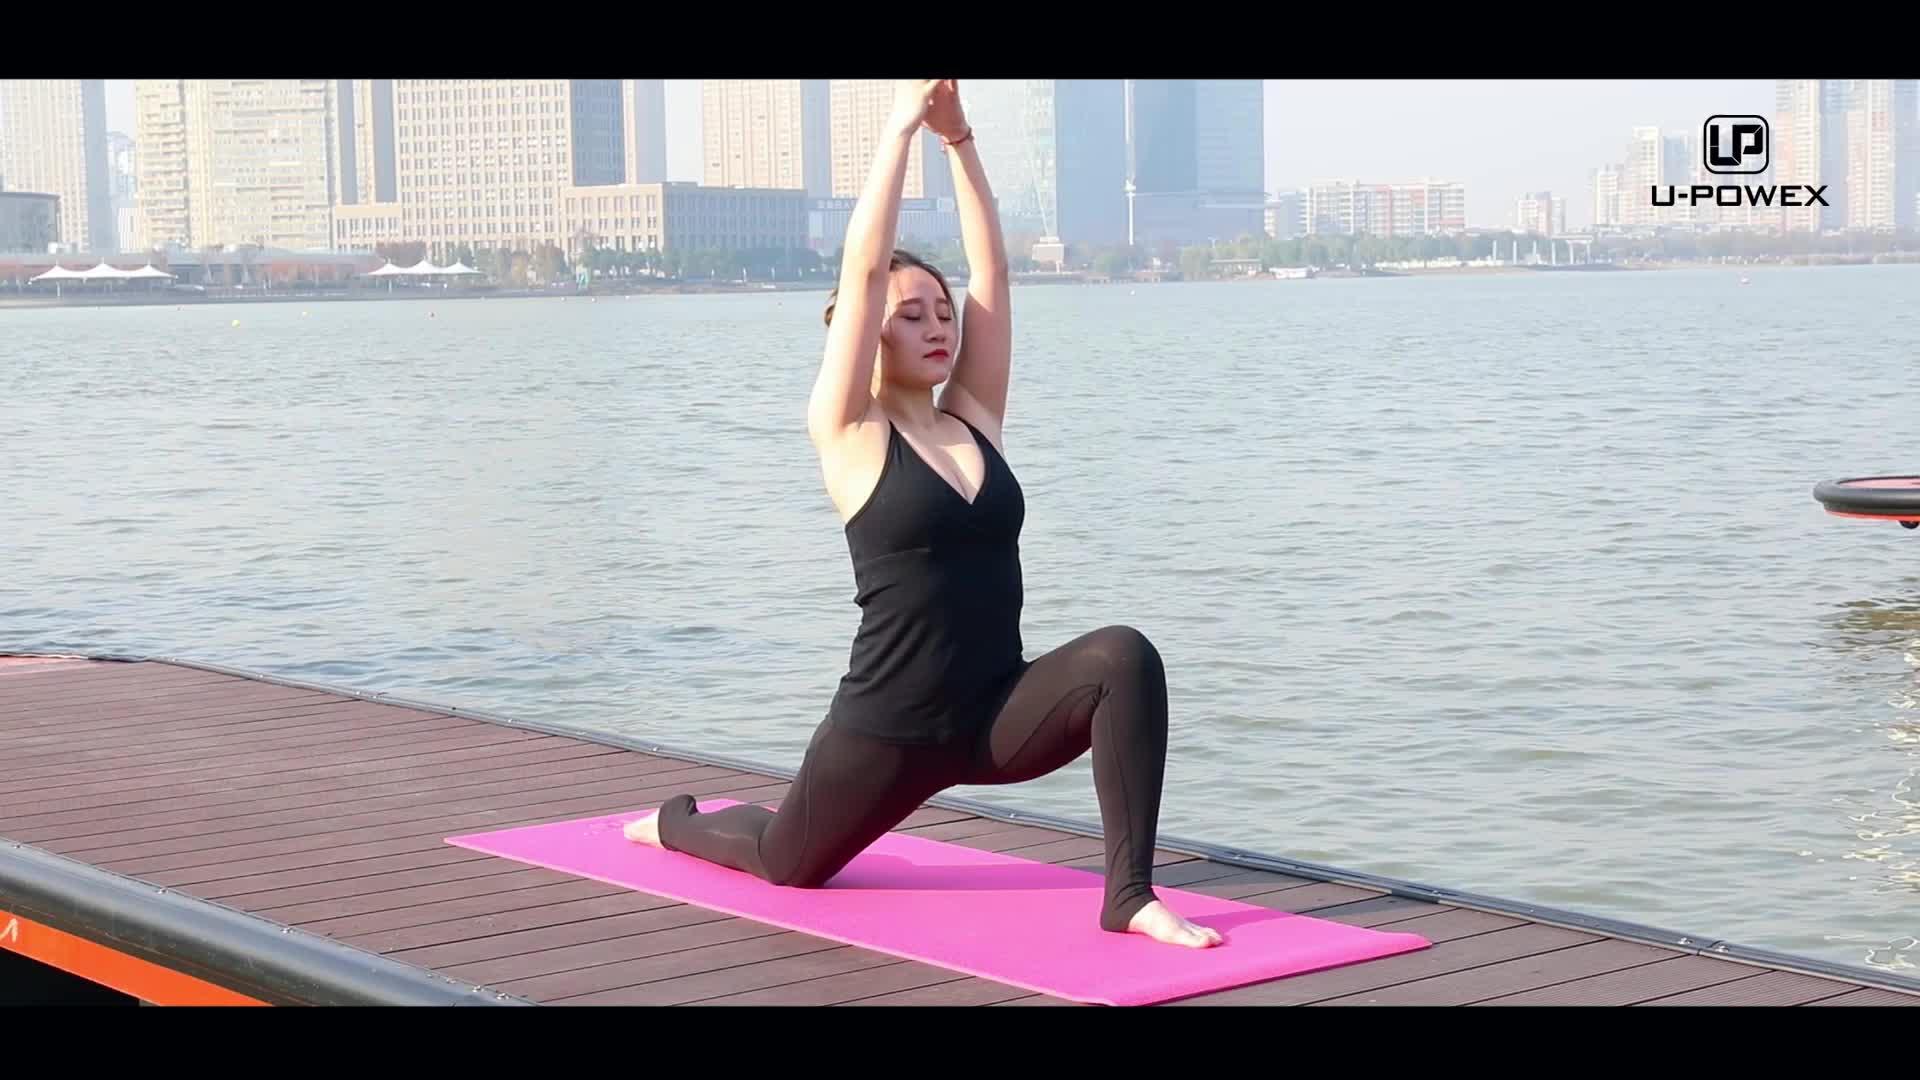 Angepasst farbe druck nicht-slip matte workout fitness matte druck pvc yoga matte